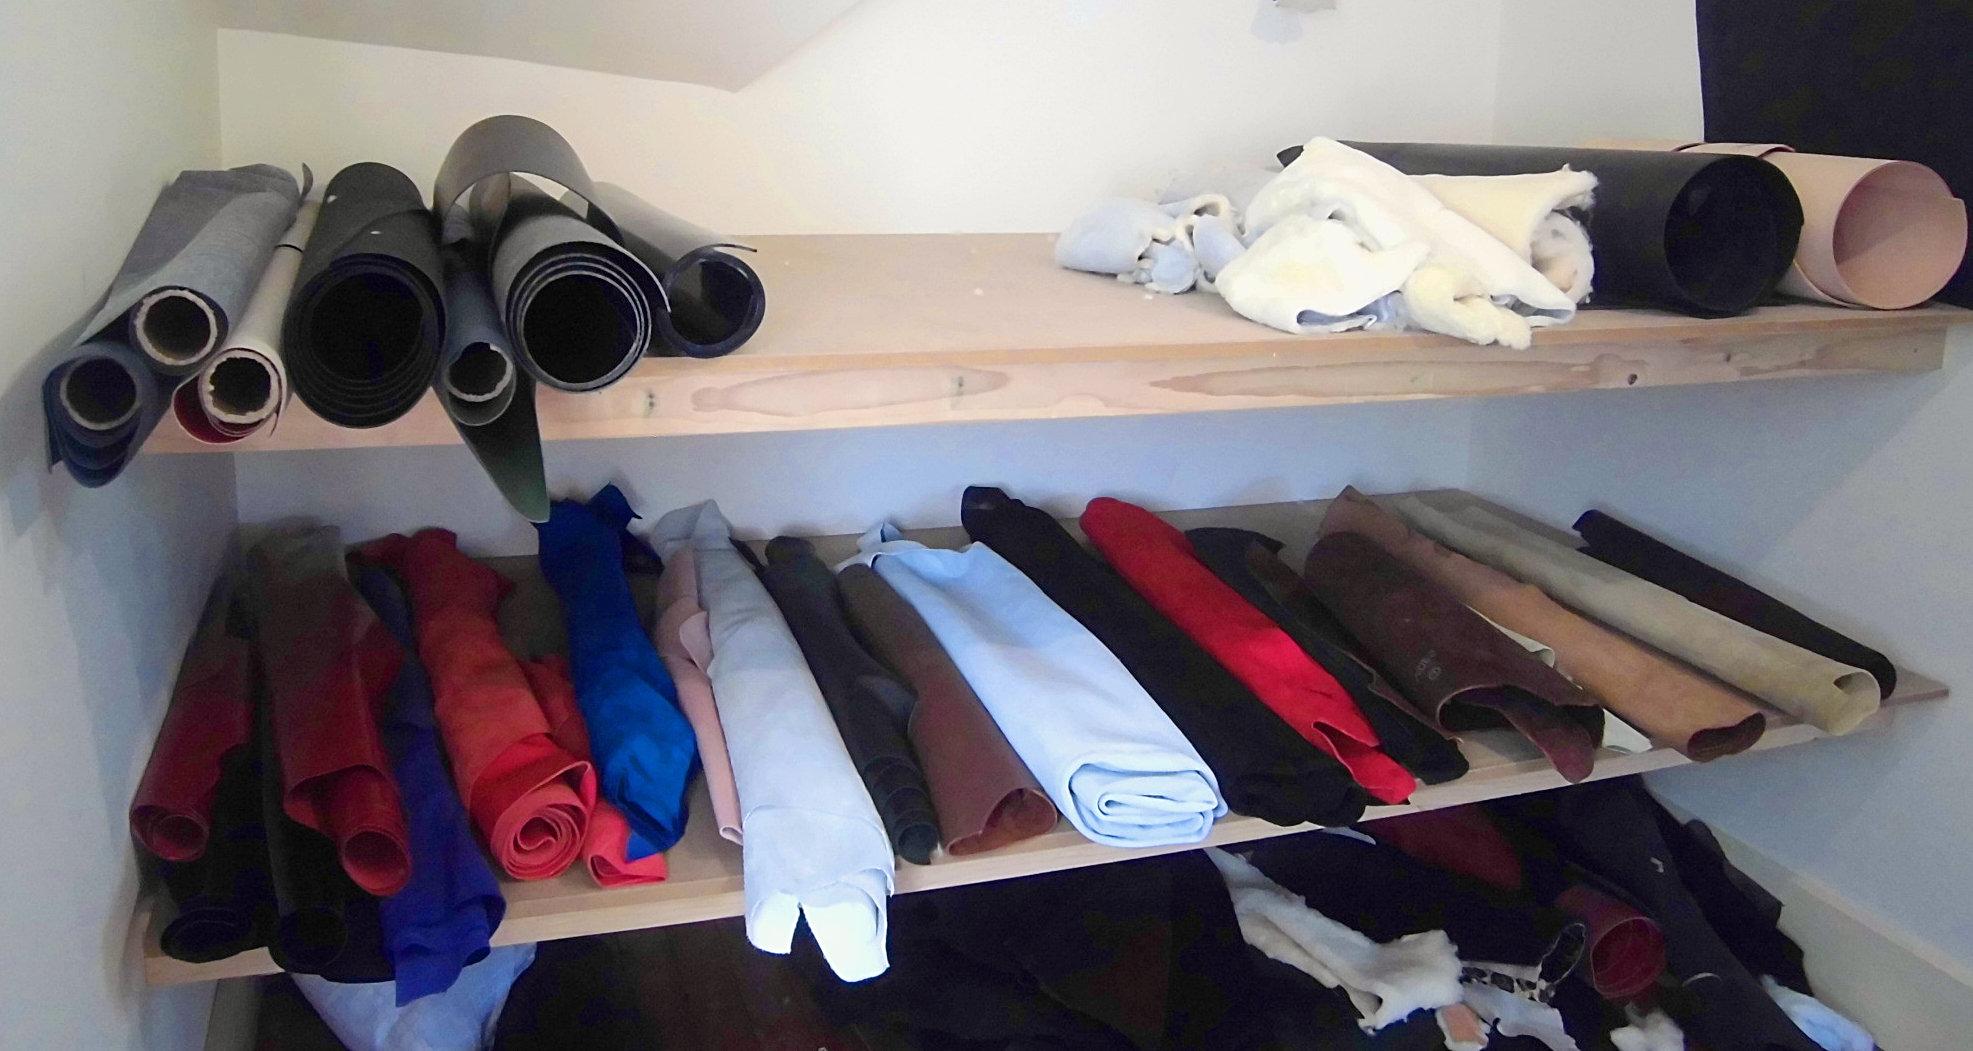 leathers-full-shelf.jpg